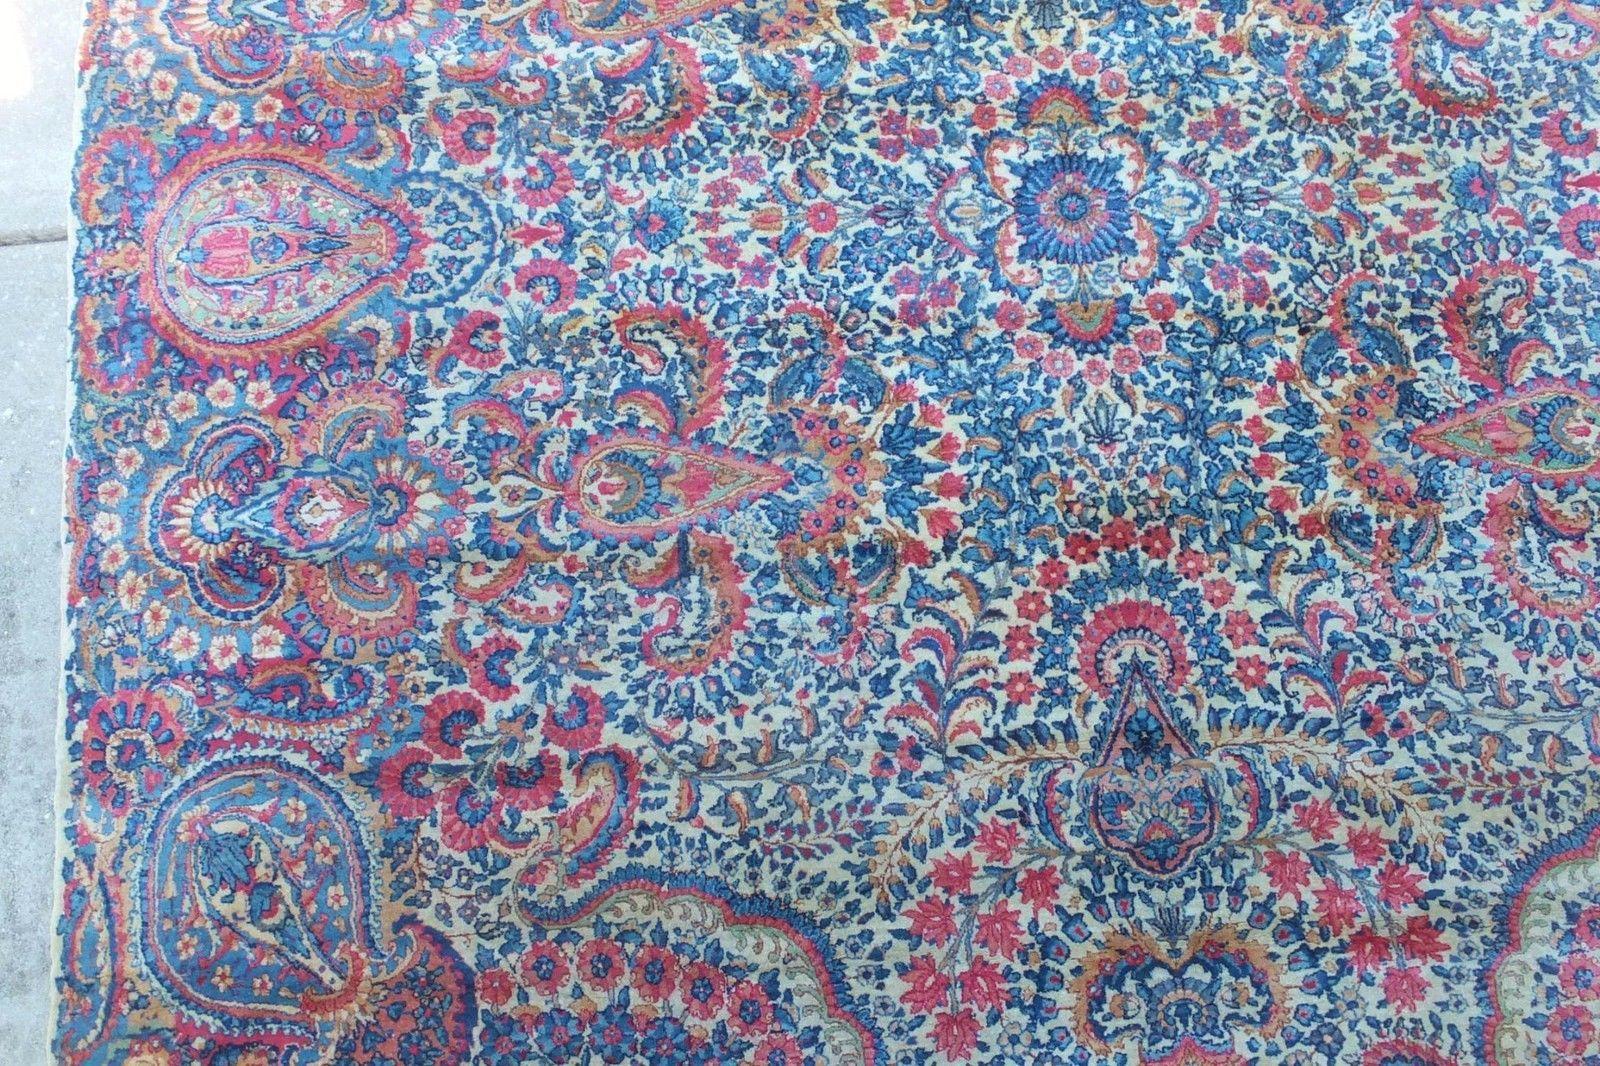 Rare 1930s Antique Persian Kerman Rug 8 6 X11 Spectacular Paisley Vibrant